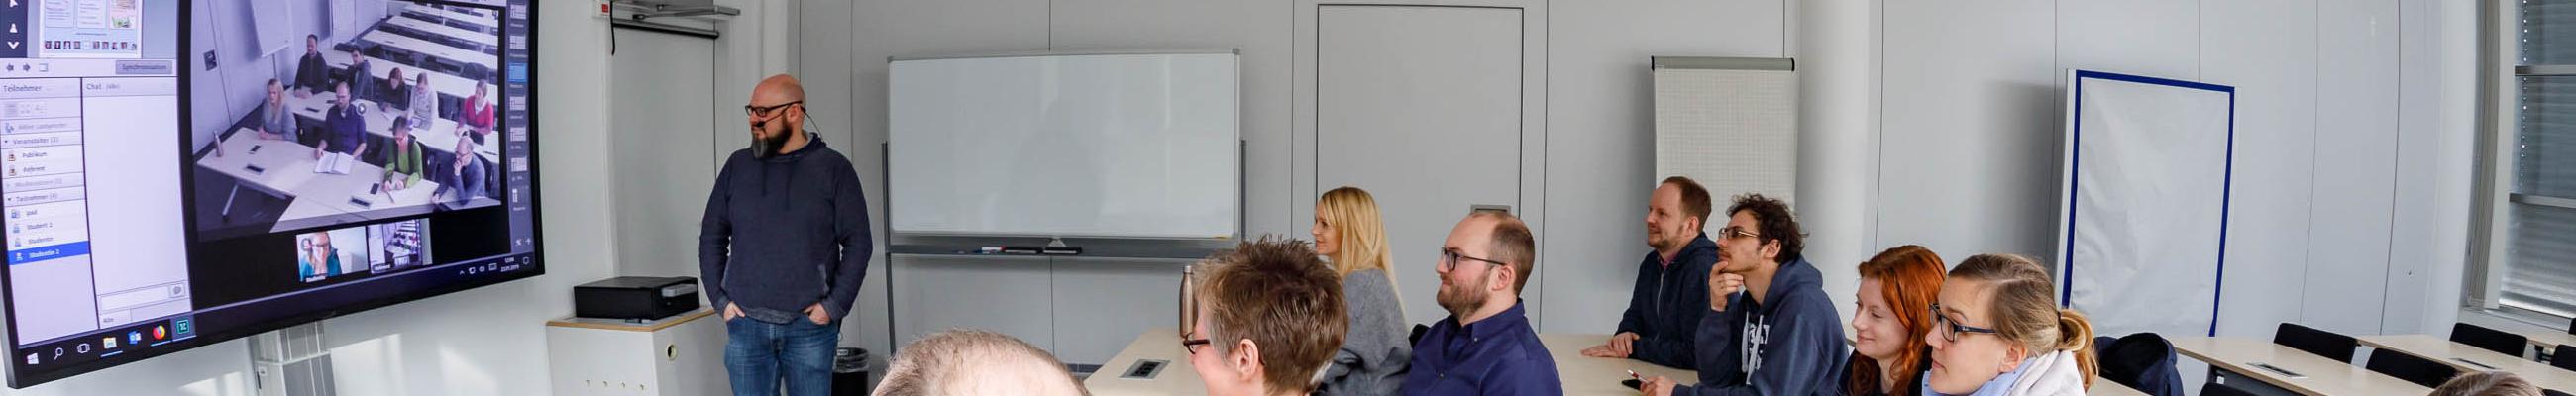 Symbolbild für E-Learning